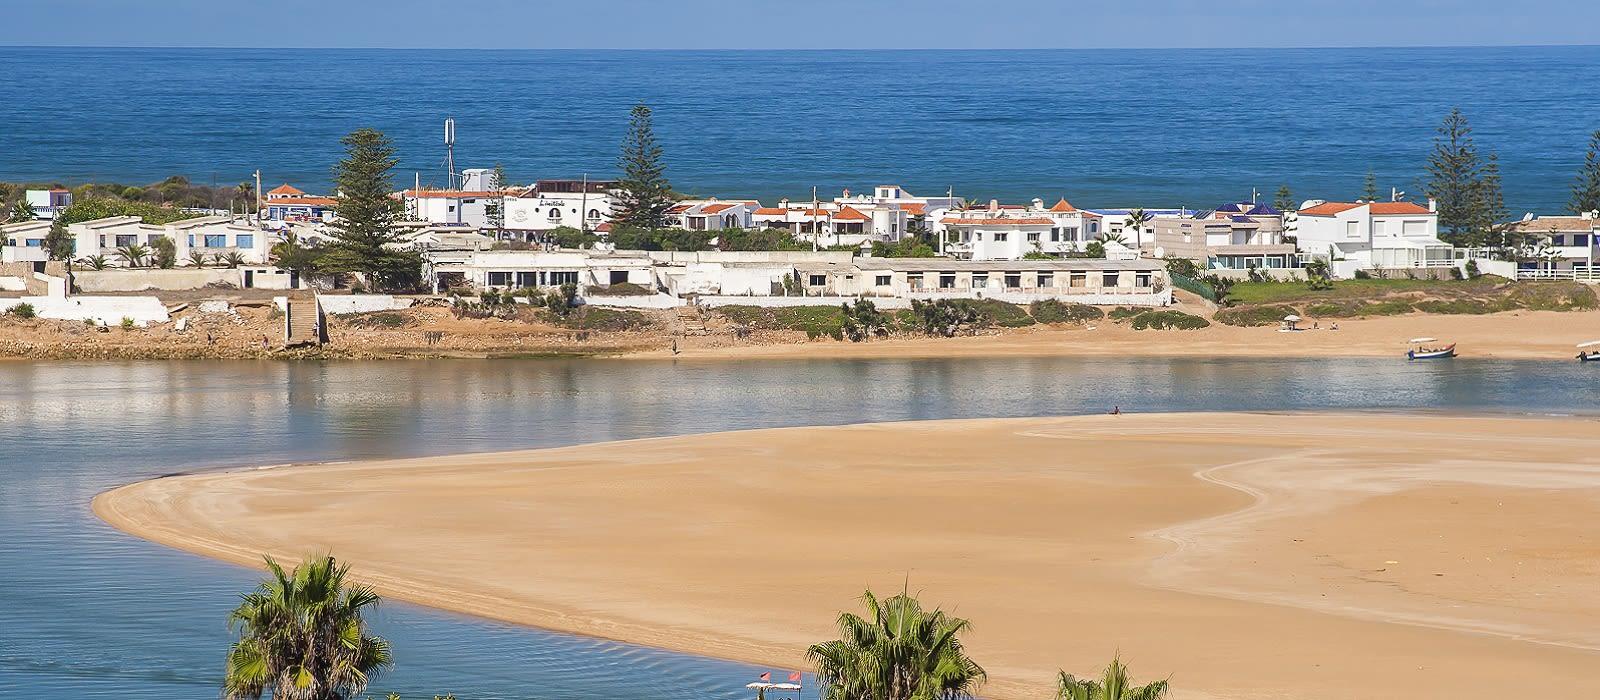 Hotel La Sultana Oualidia Morocco